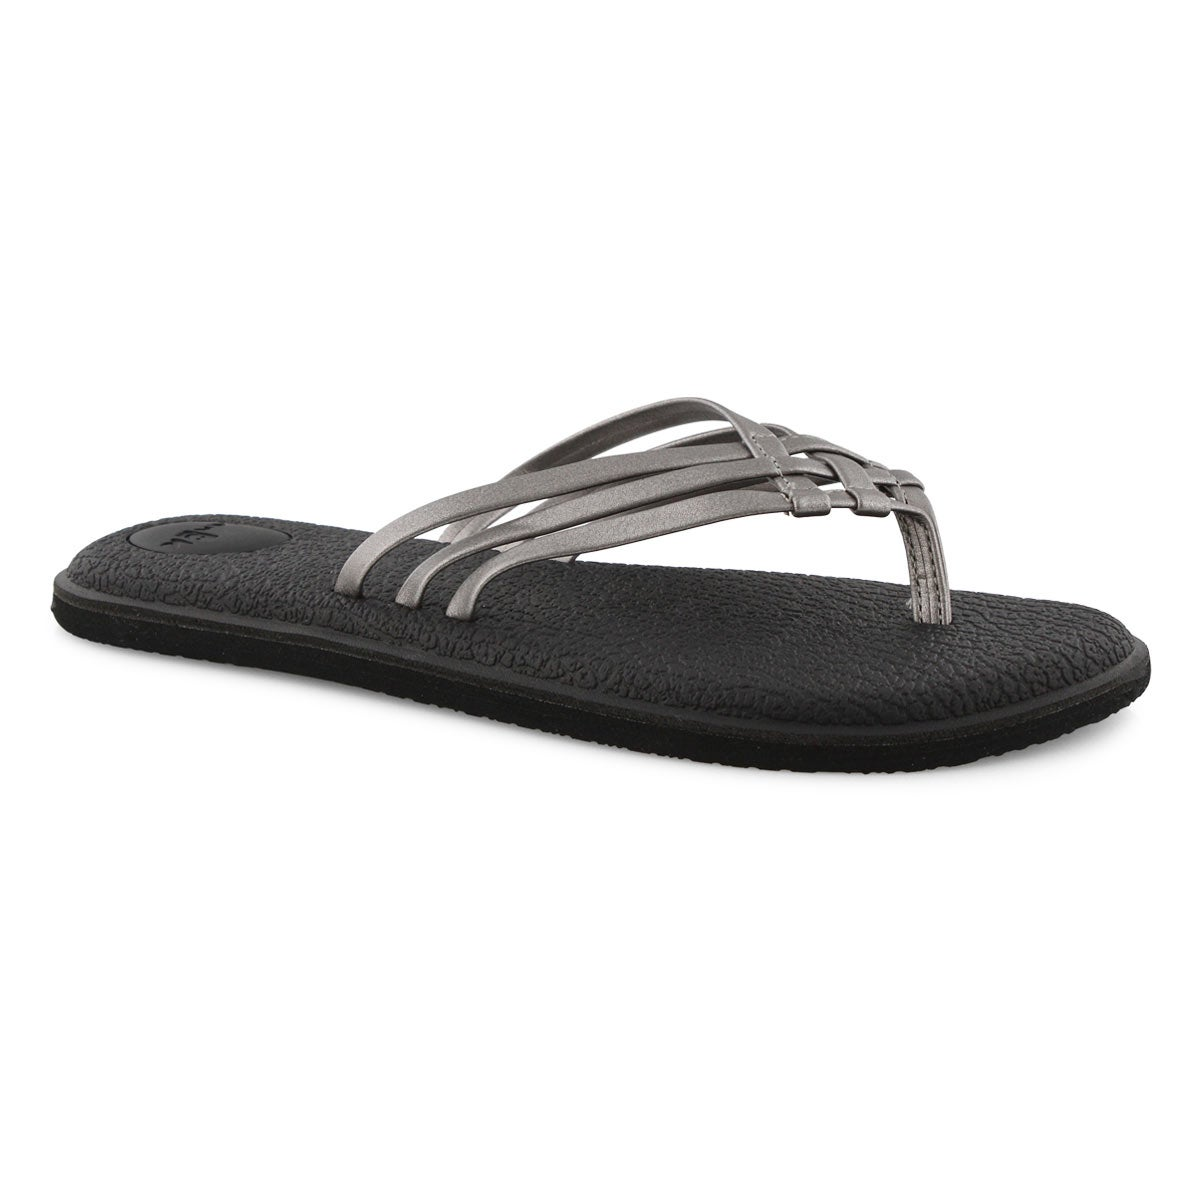 Lds Yoga Salty Metallic pwtr flip flop